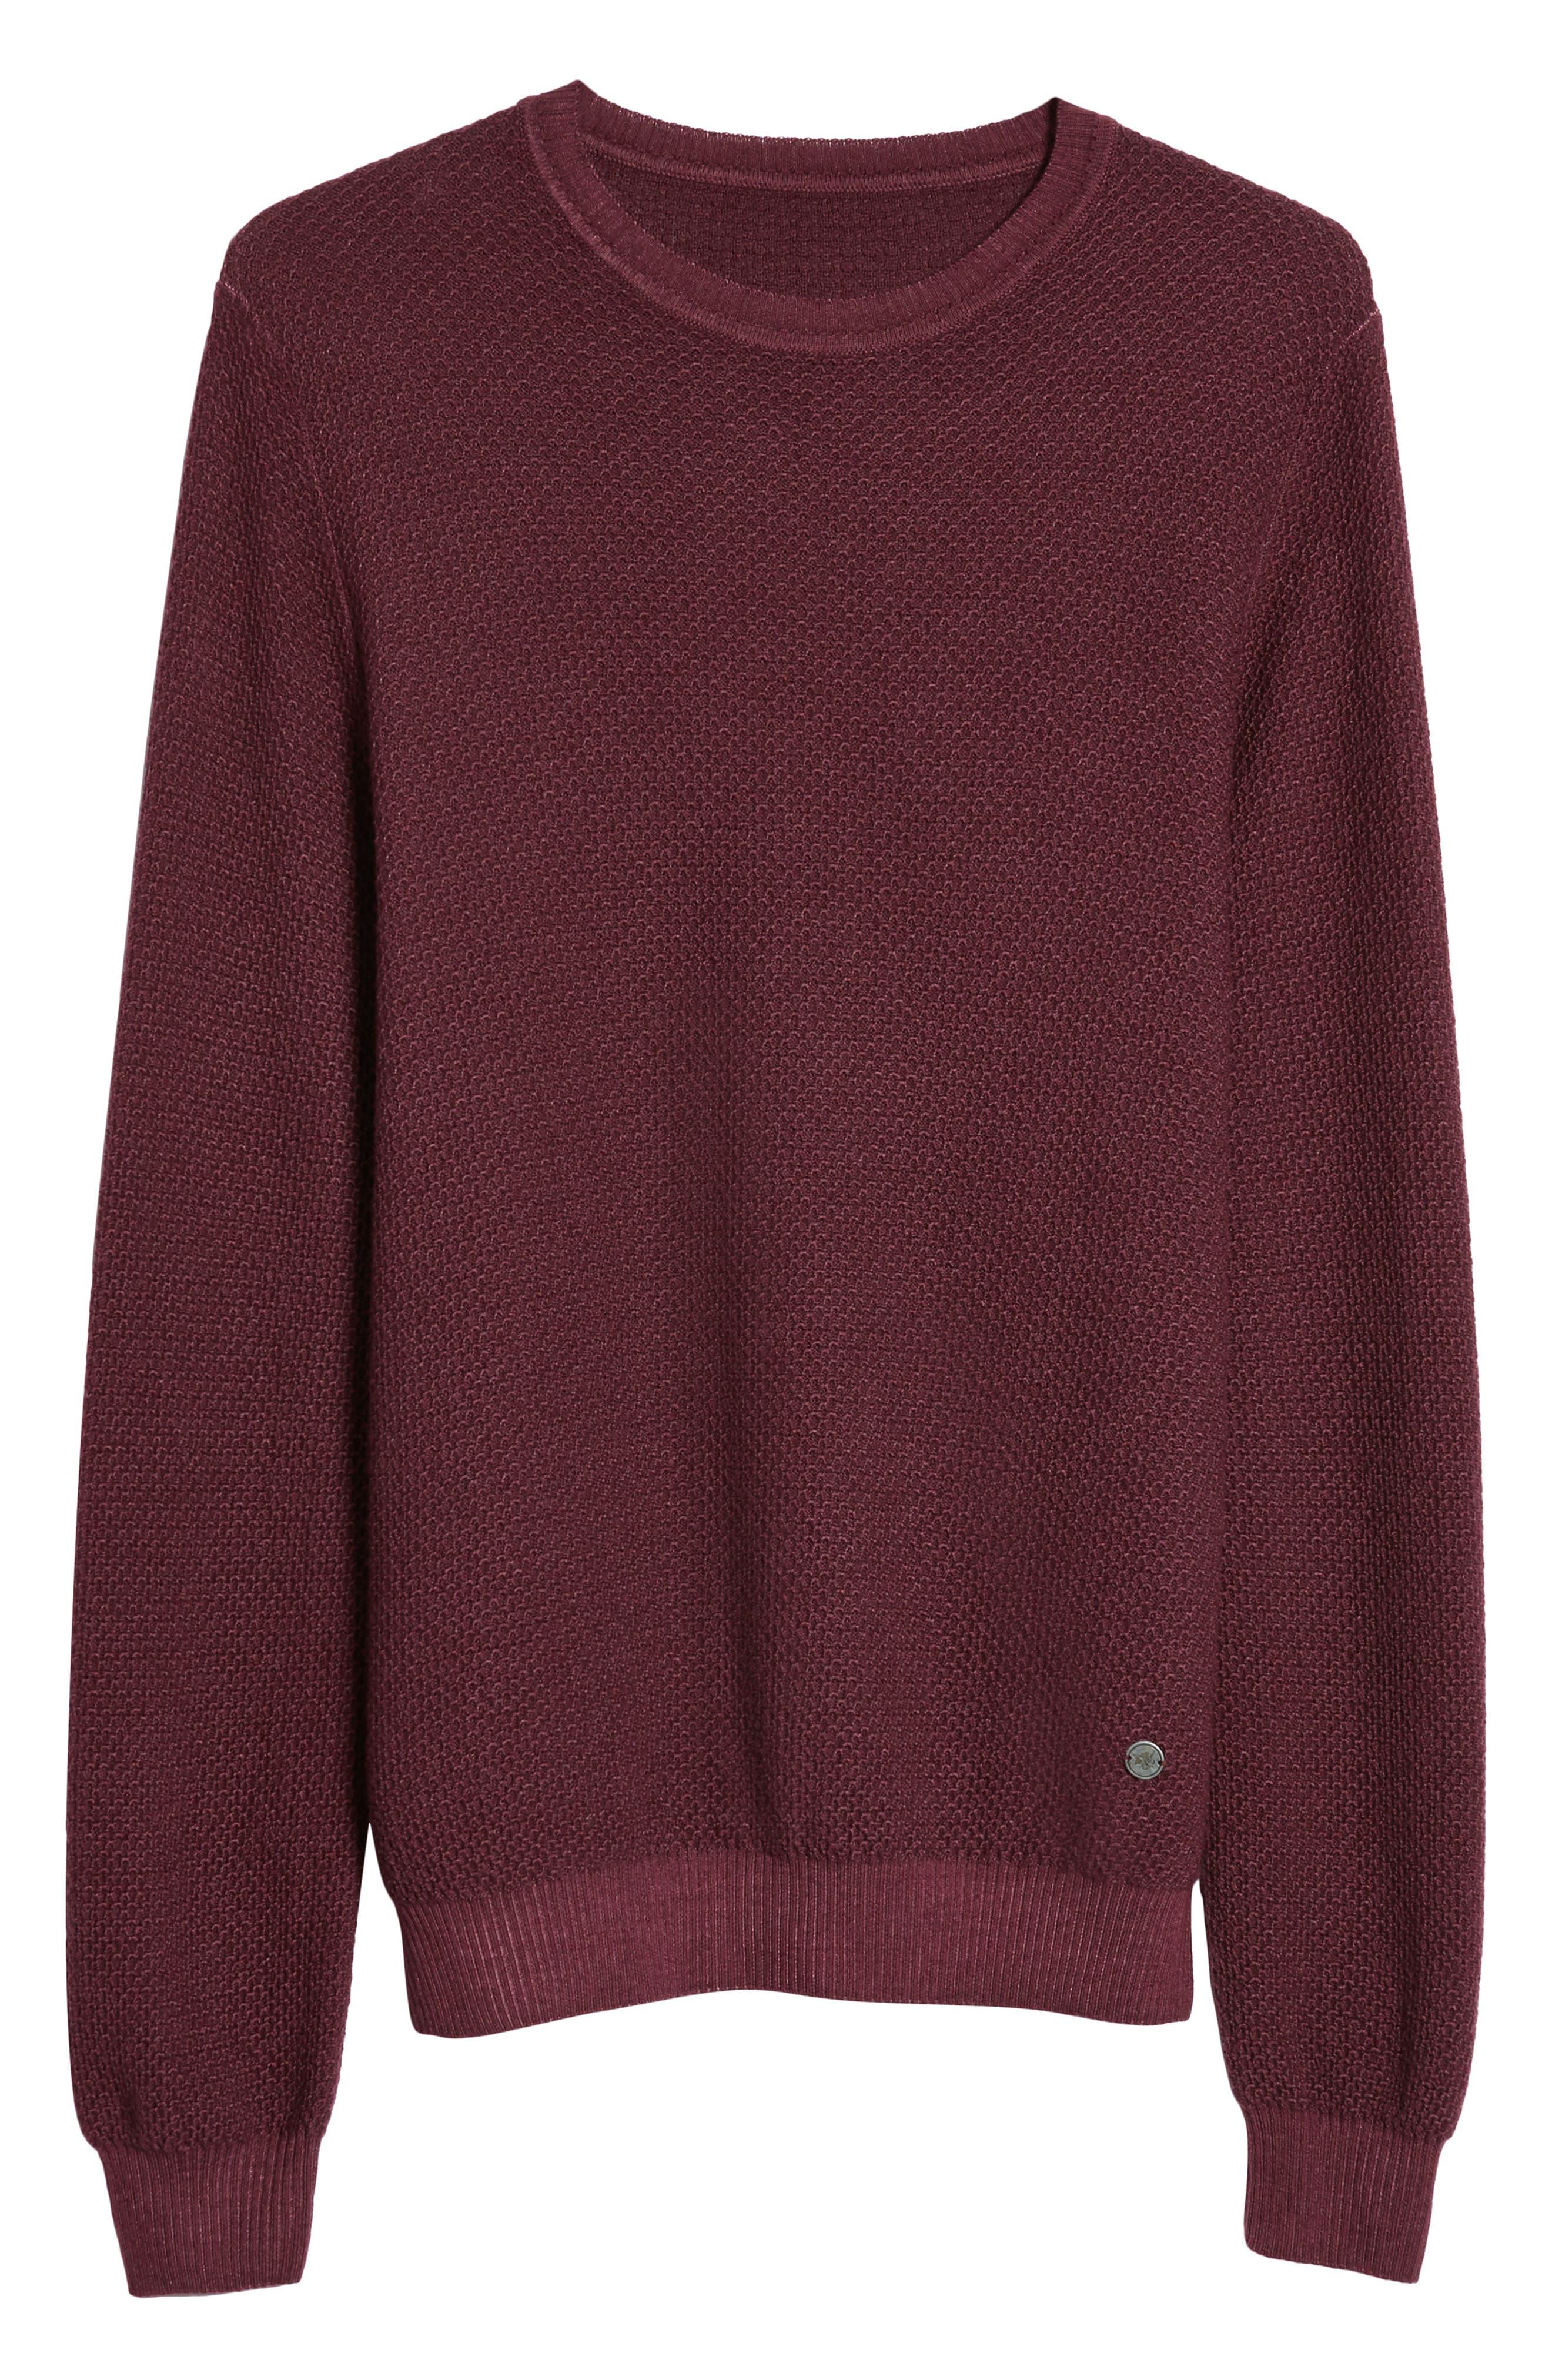 Honeycomb Merino Crewneck Sweater,                             Alternate thumbnail 6, color,                             Burgundy